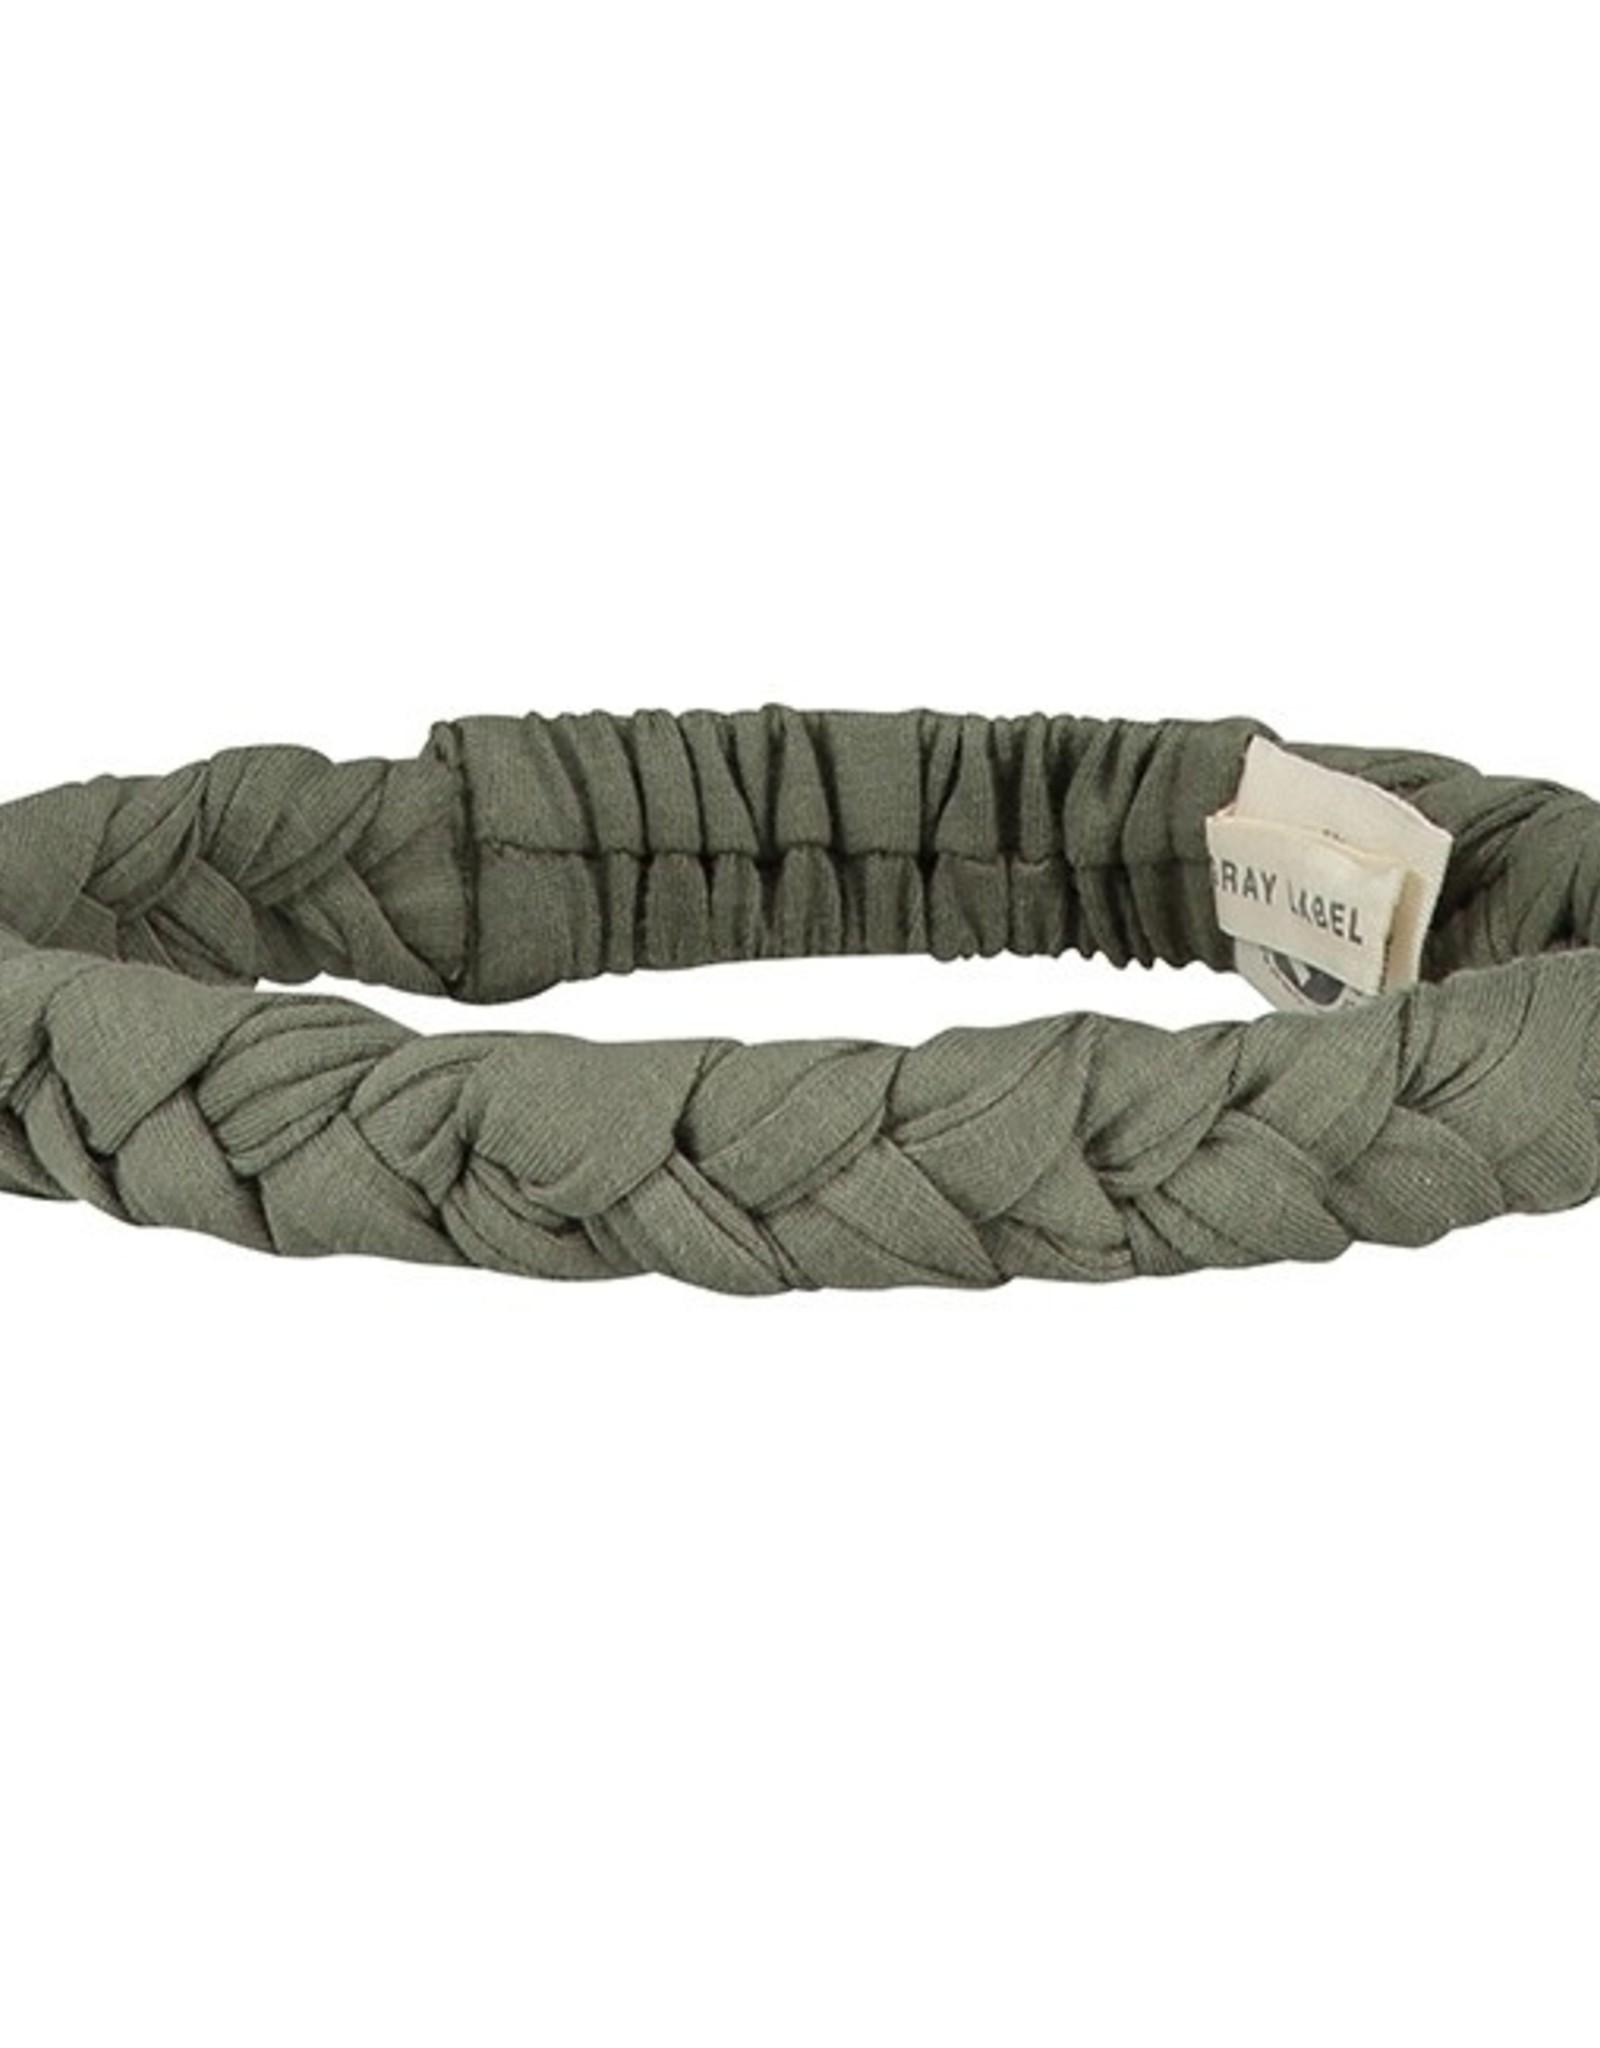 Gray Label Braid headband